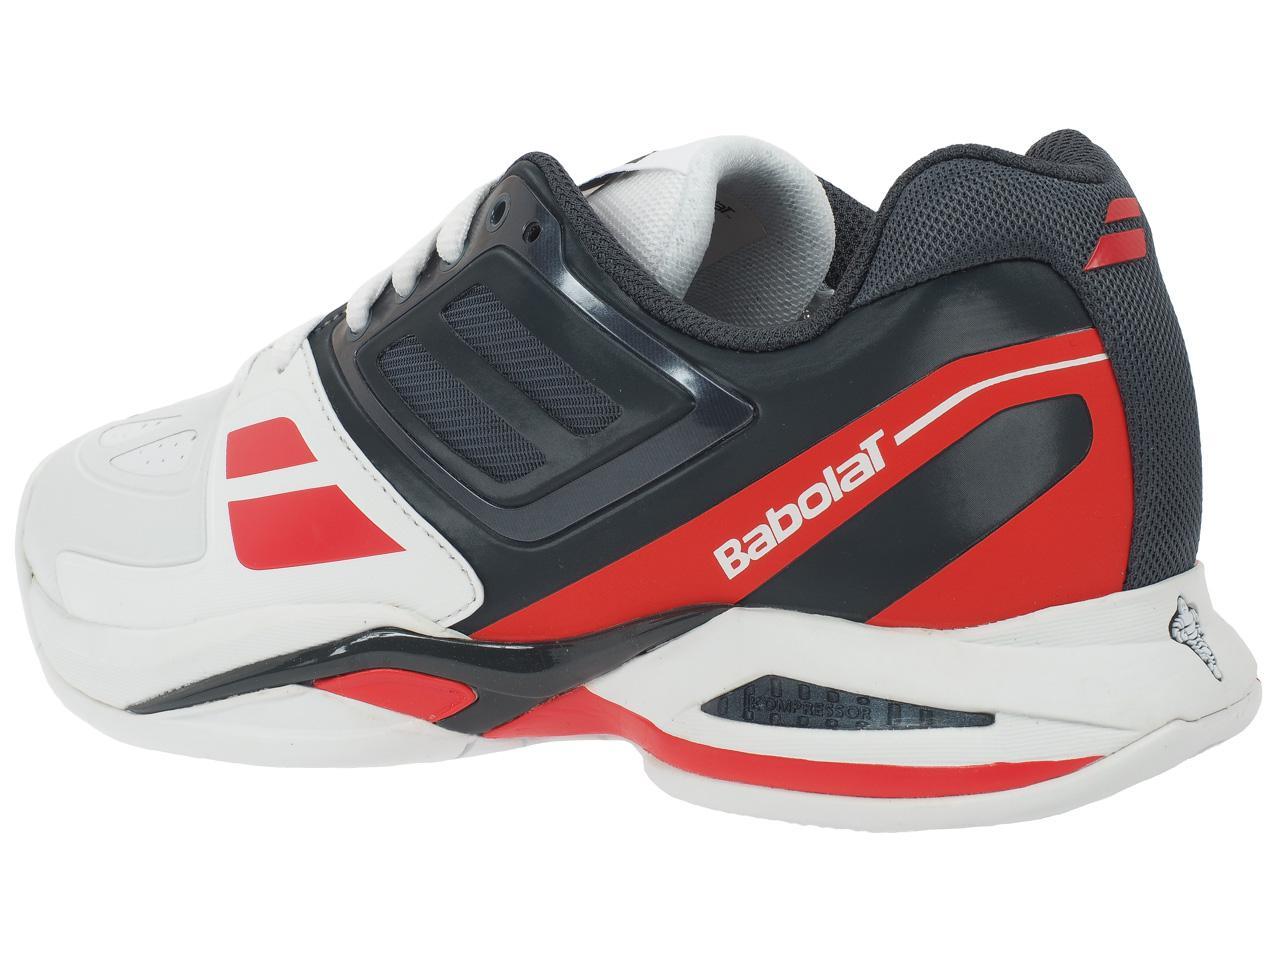 Chaussures-tennis-Babolat-Propulse-team-16-blc-roug-Rouge-70074-Neuf